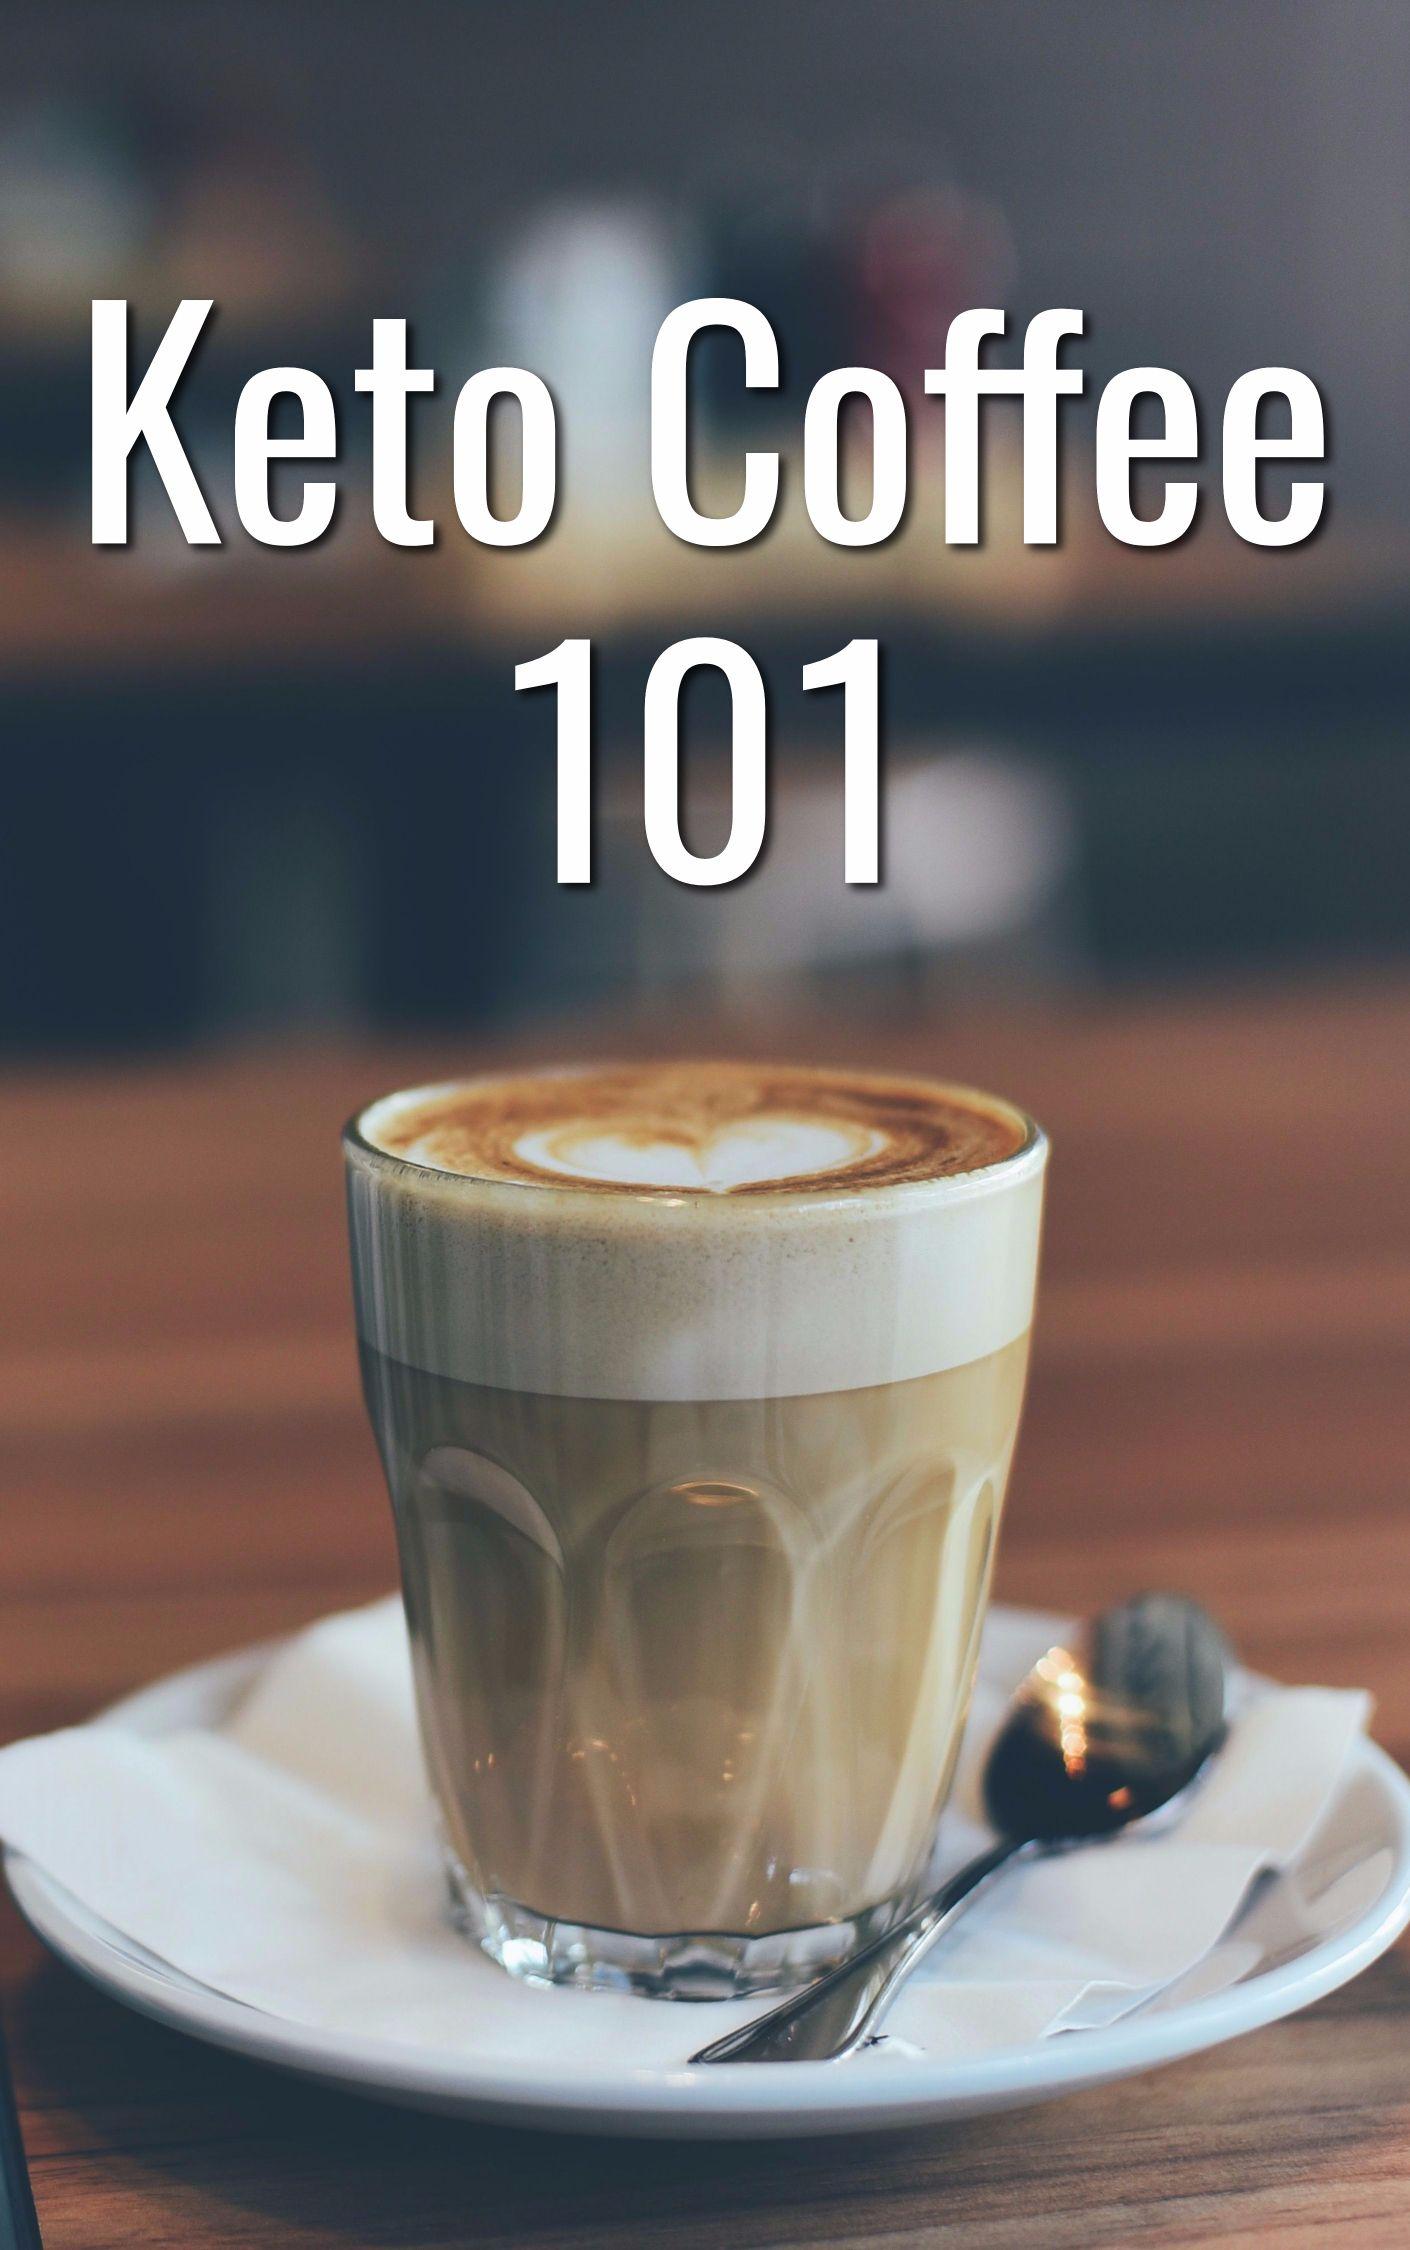 Keto Coffee 101 in 2020 Keto coffee recipe, Keto coffee